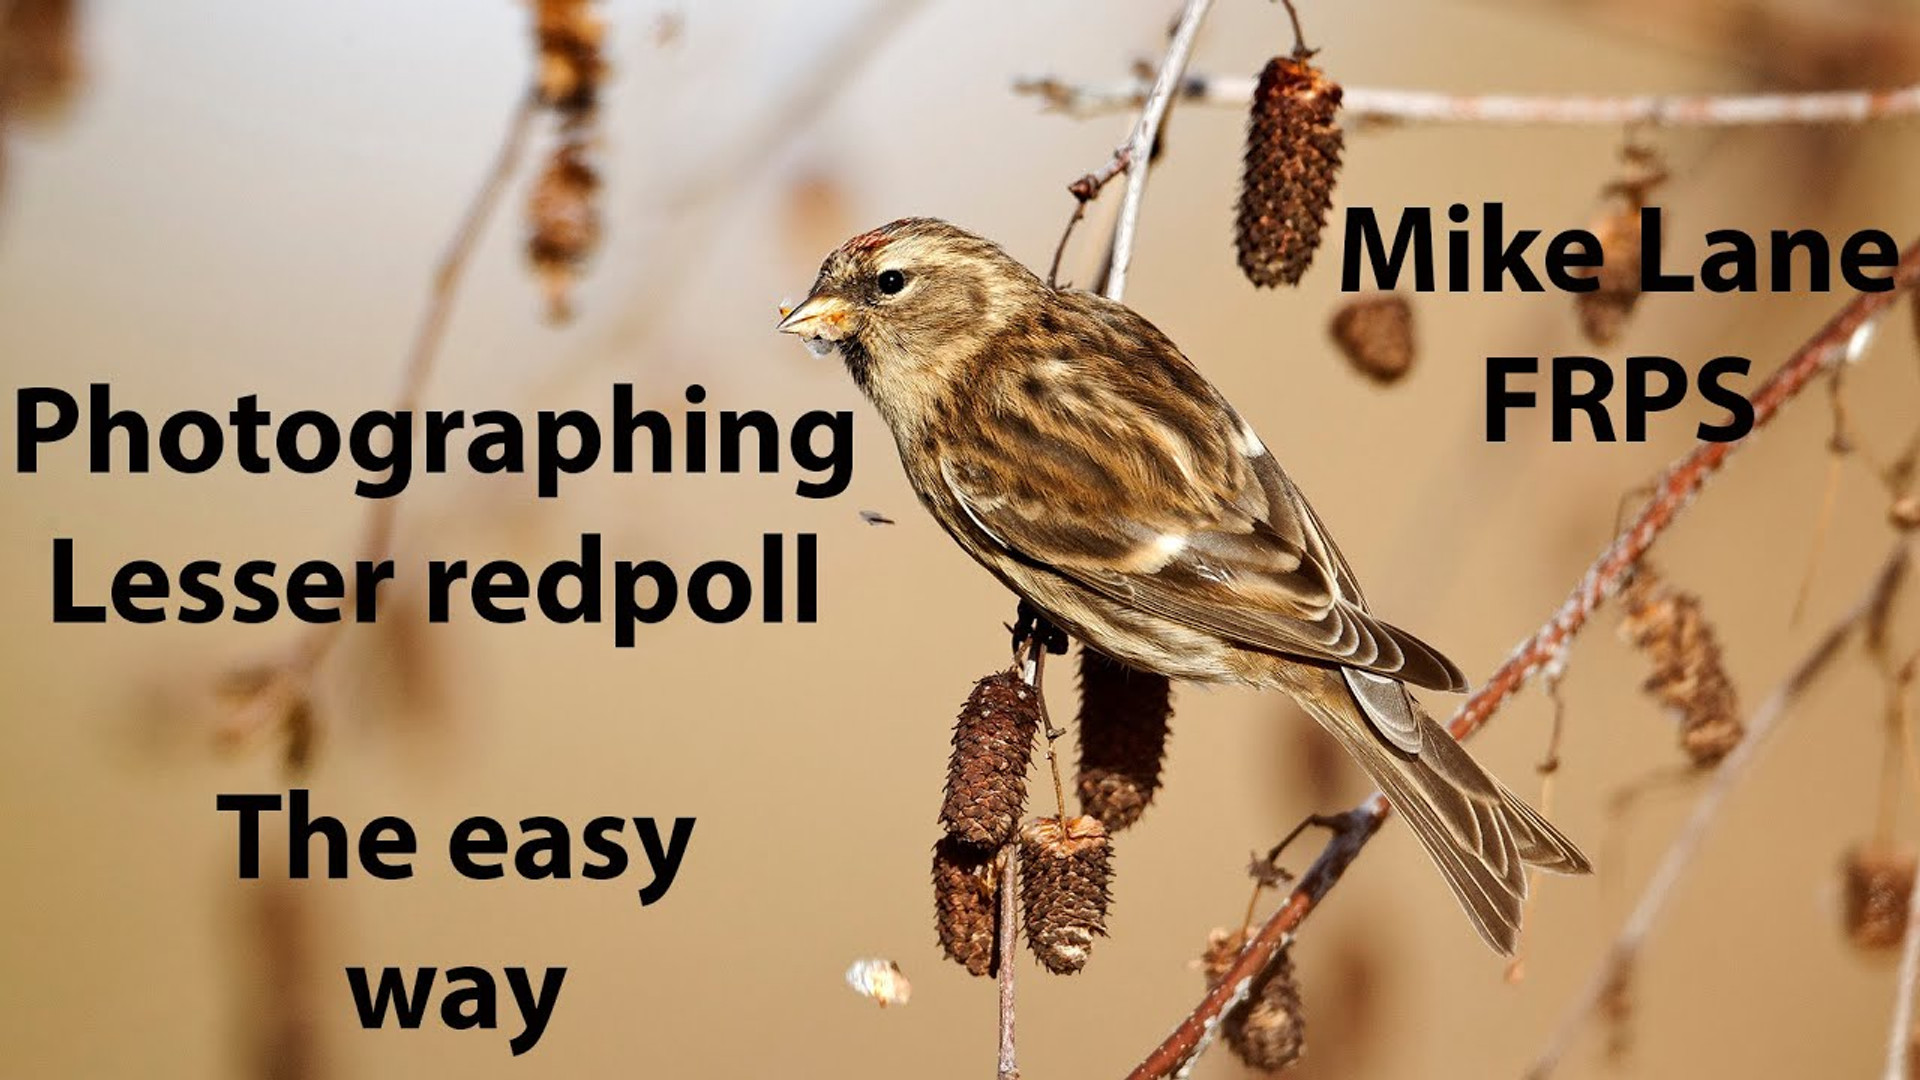 Photographing Lesser redpolls